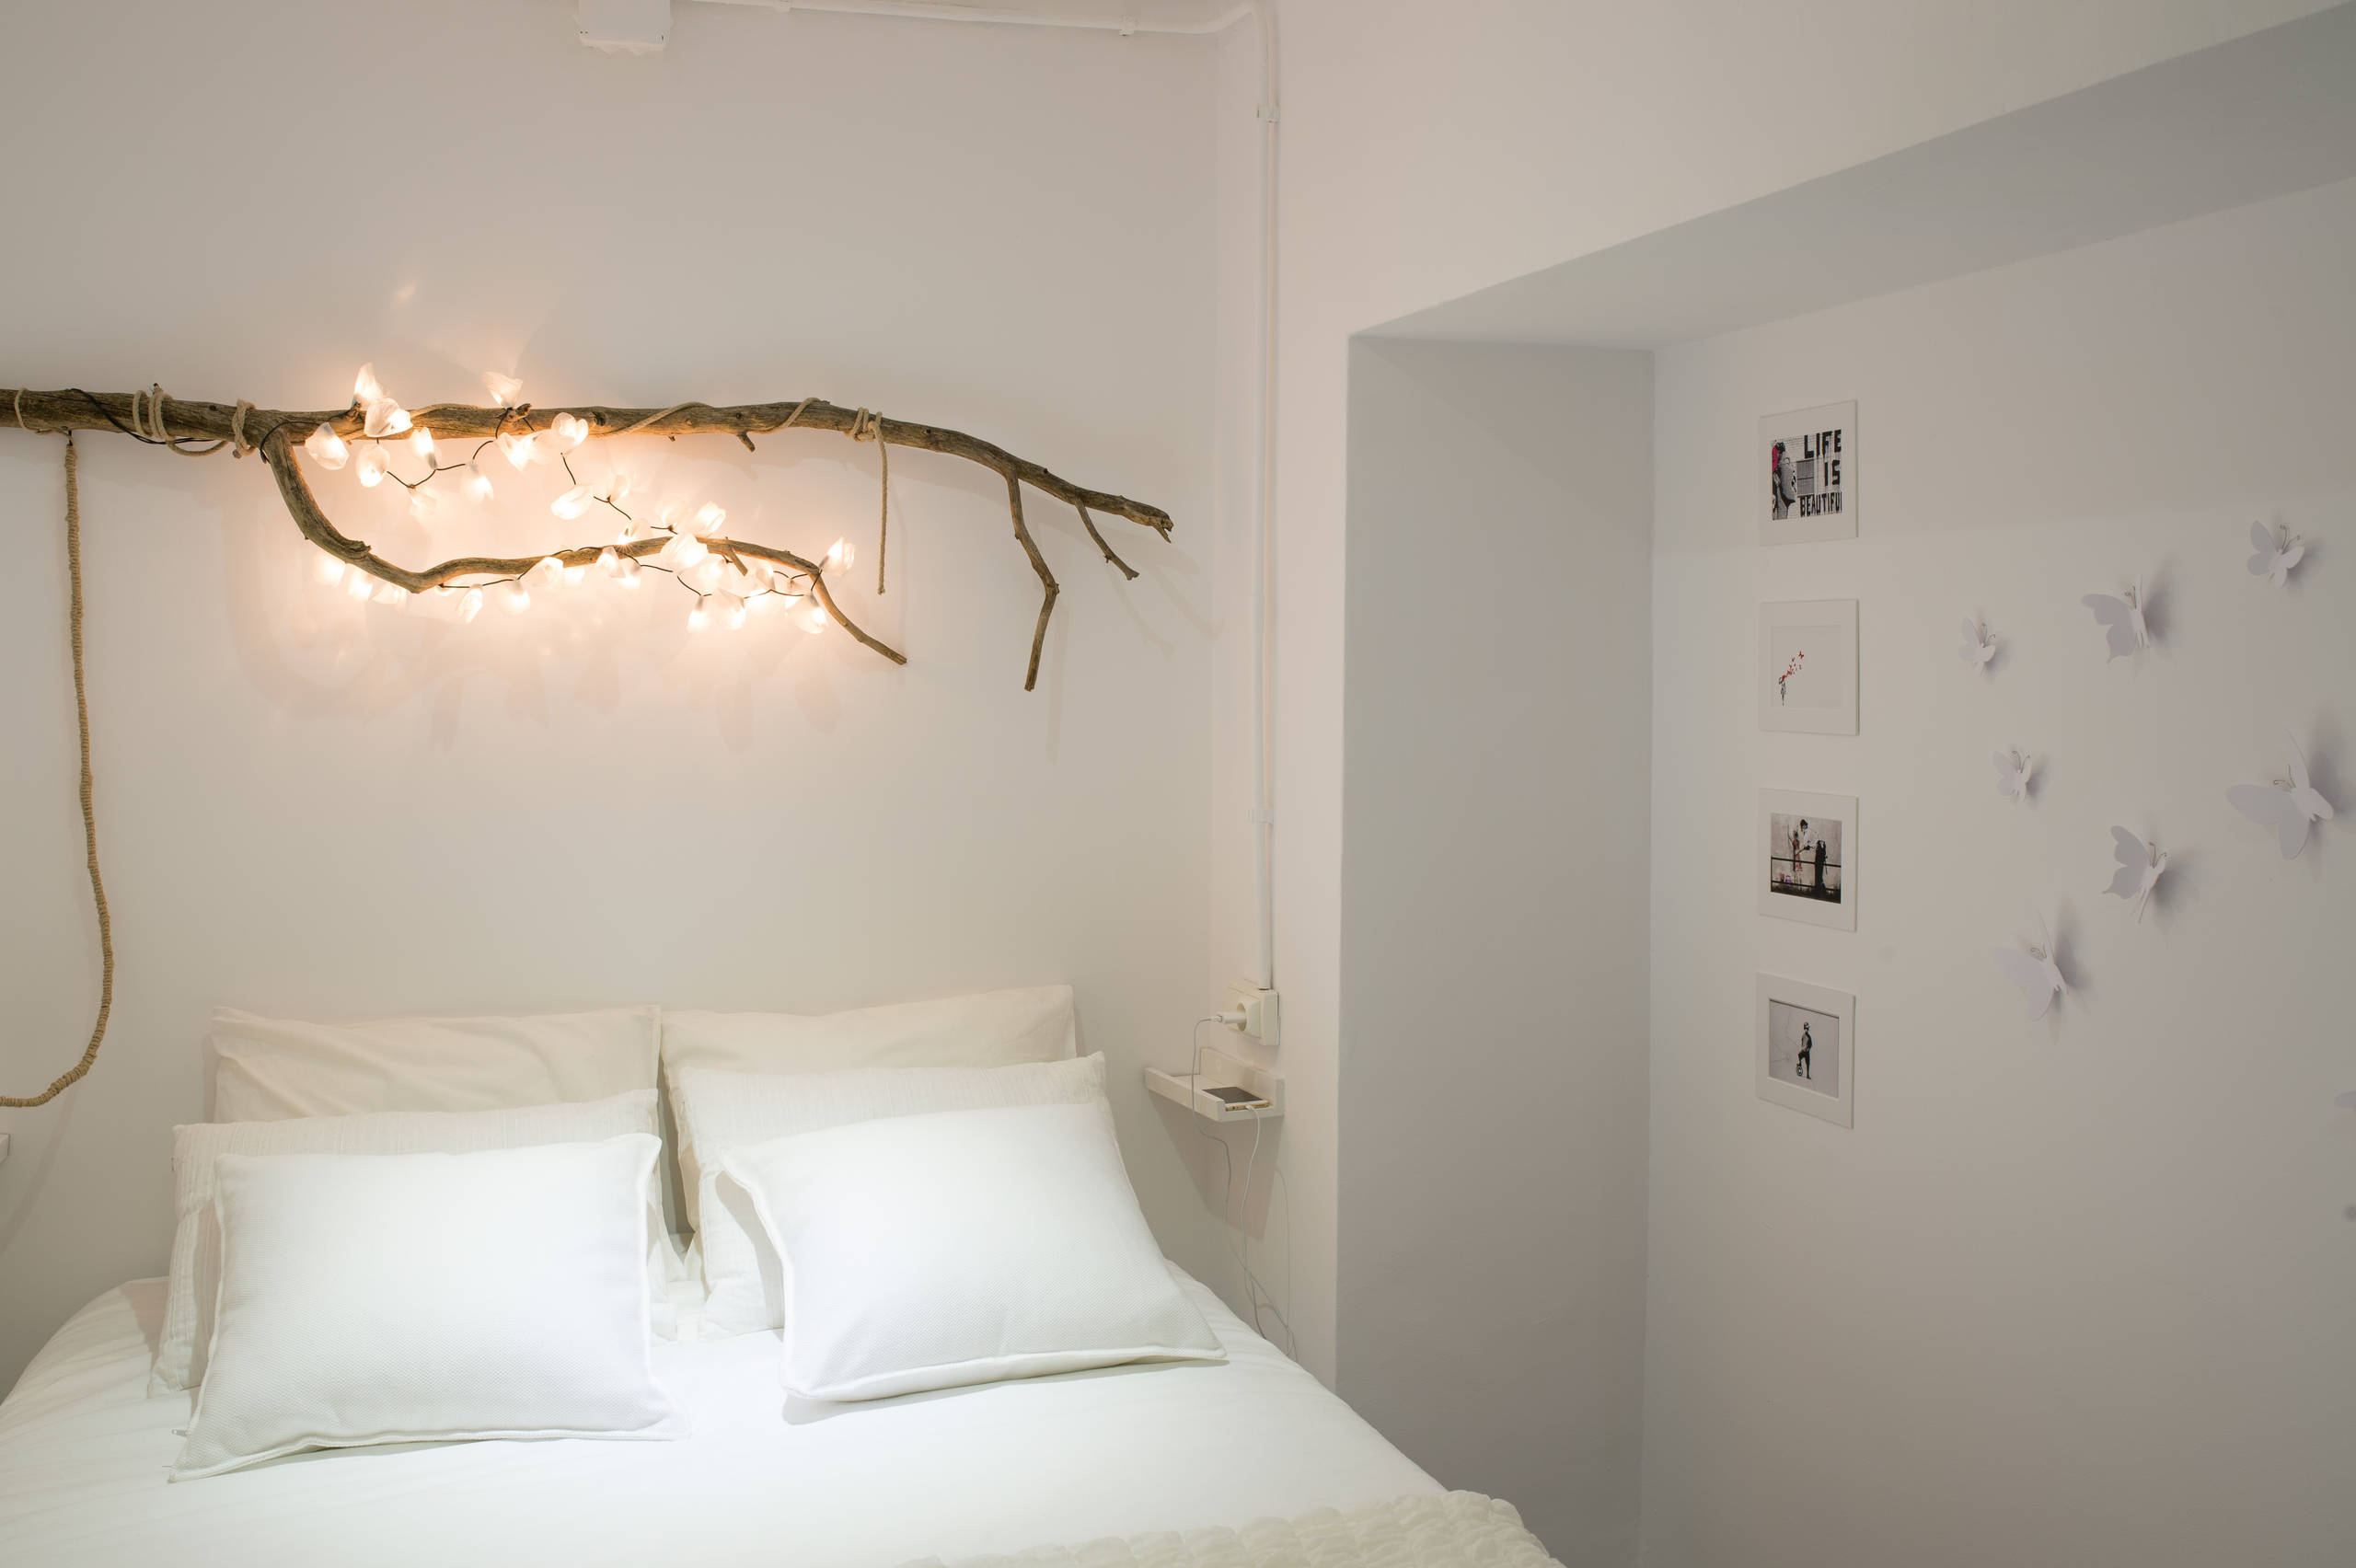 Dormitorio con luces cálidas para dar confort